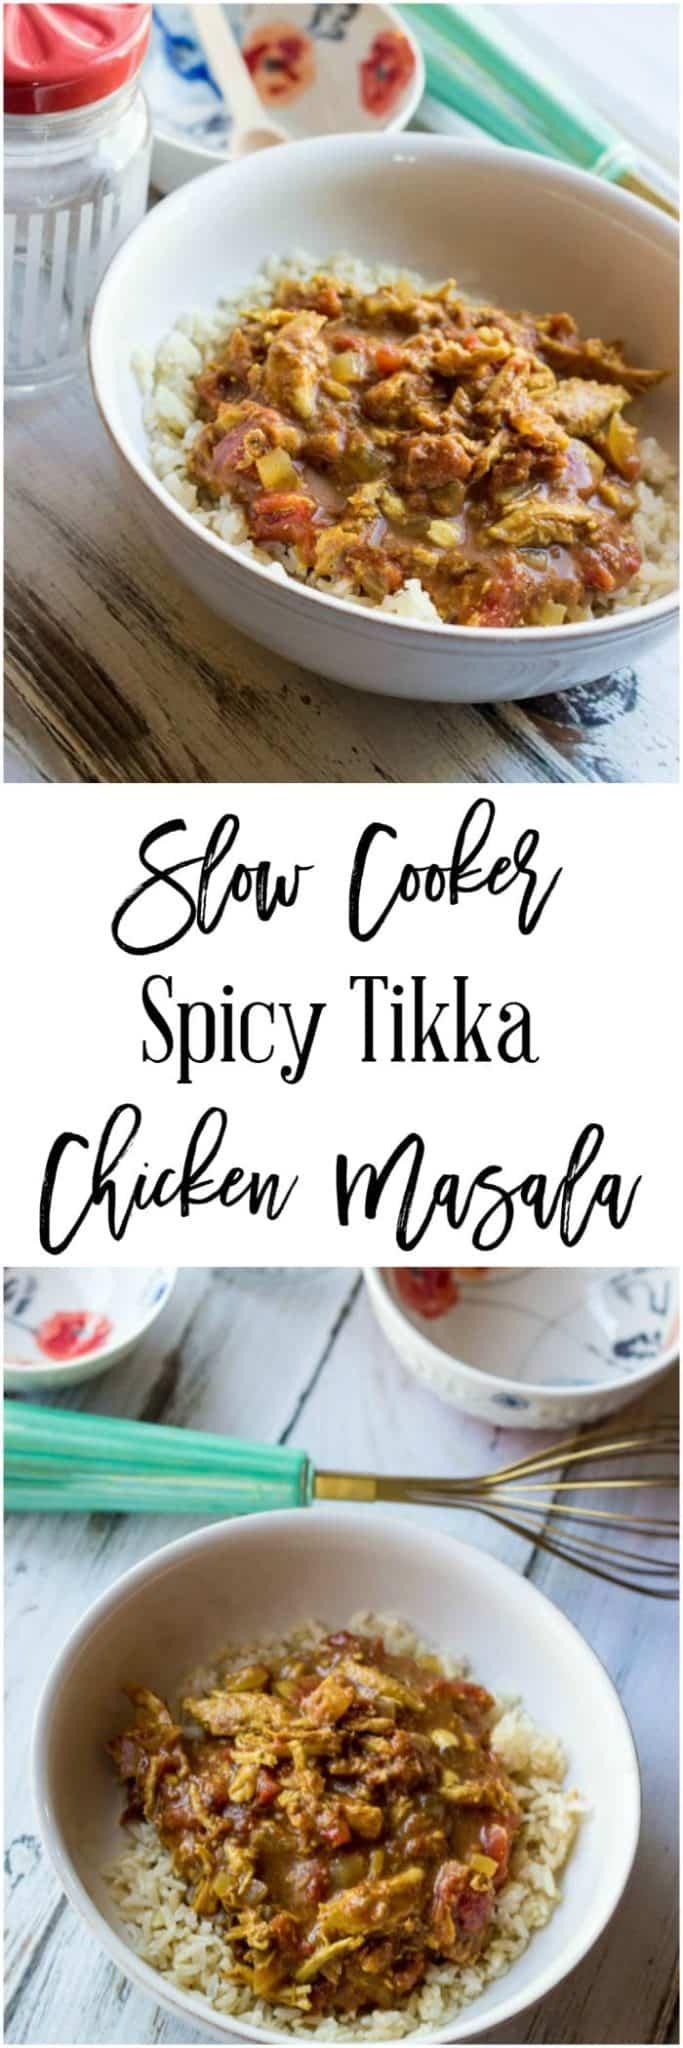 Slow Cooker Spicy Tikka Chicken Masala